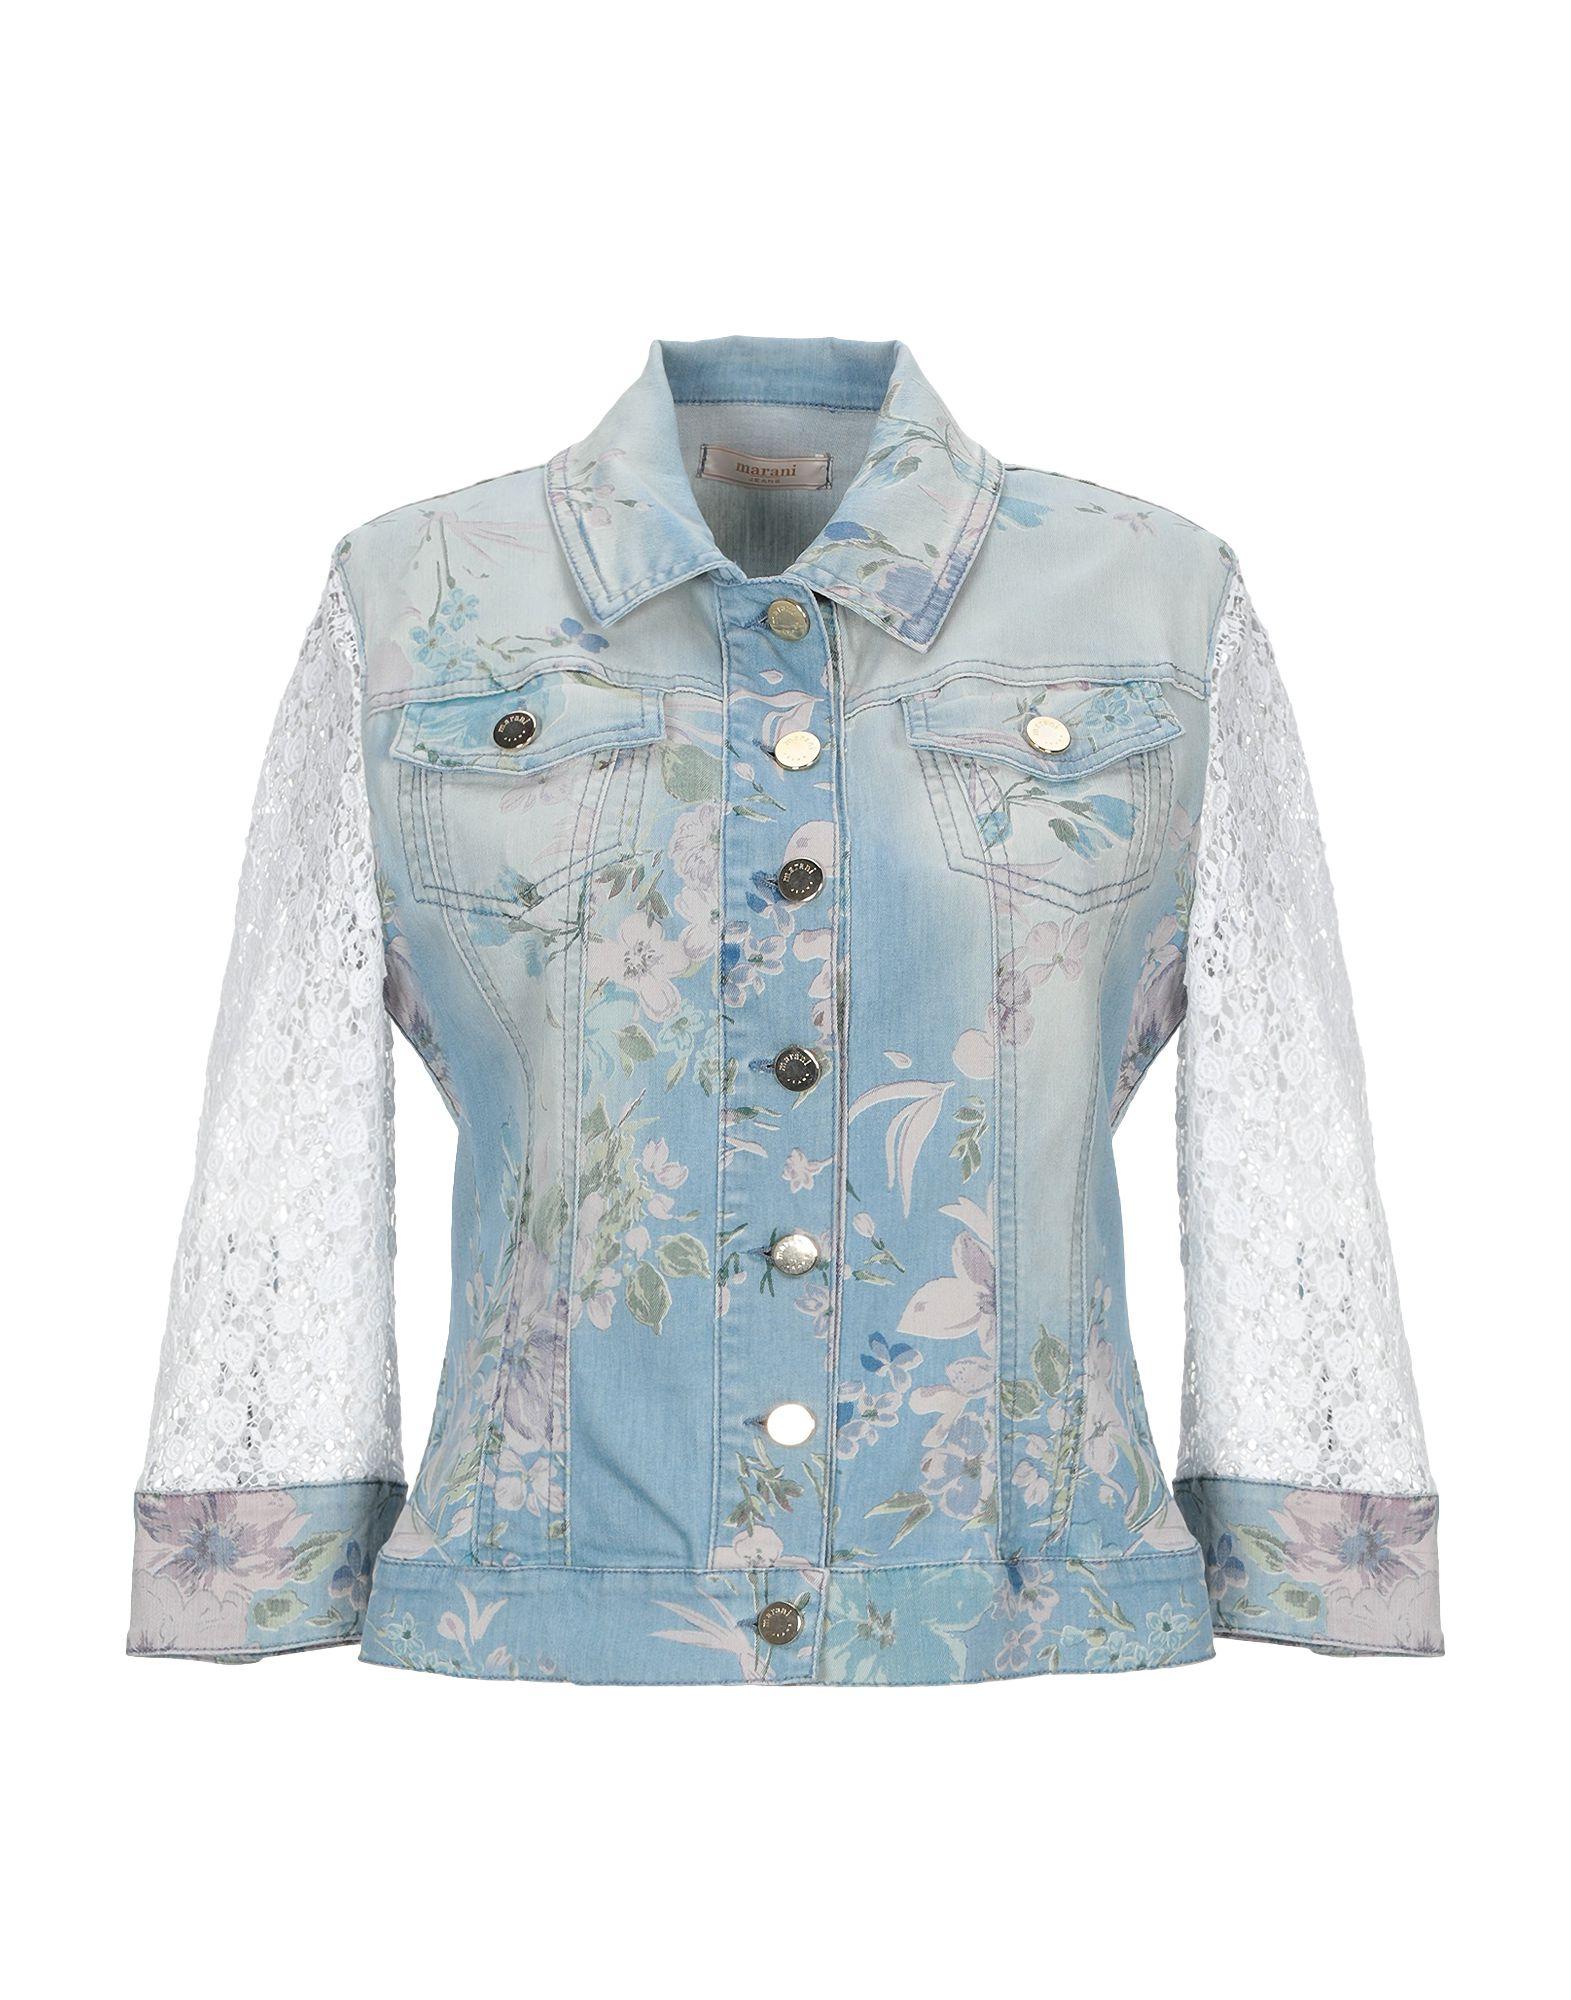 MARANI JEANS Джинсовая верхняя одежда garcia jeans джинсовая верхняя одежда